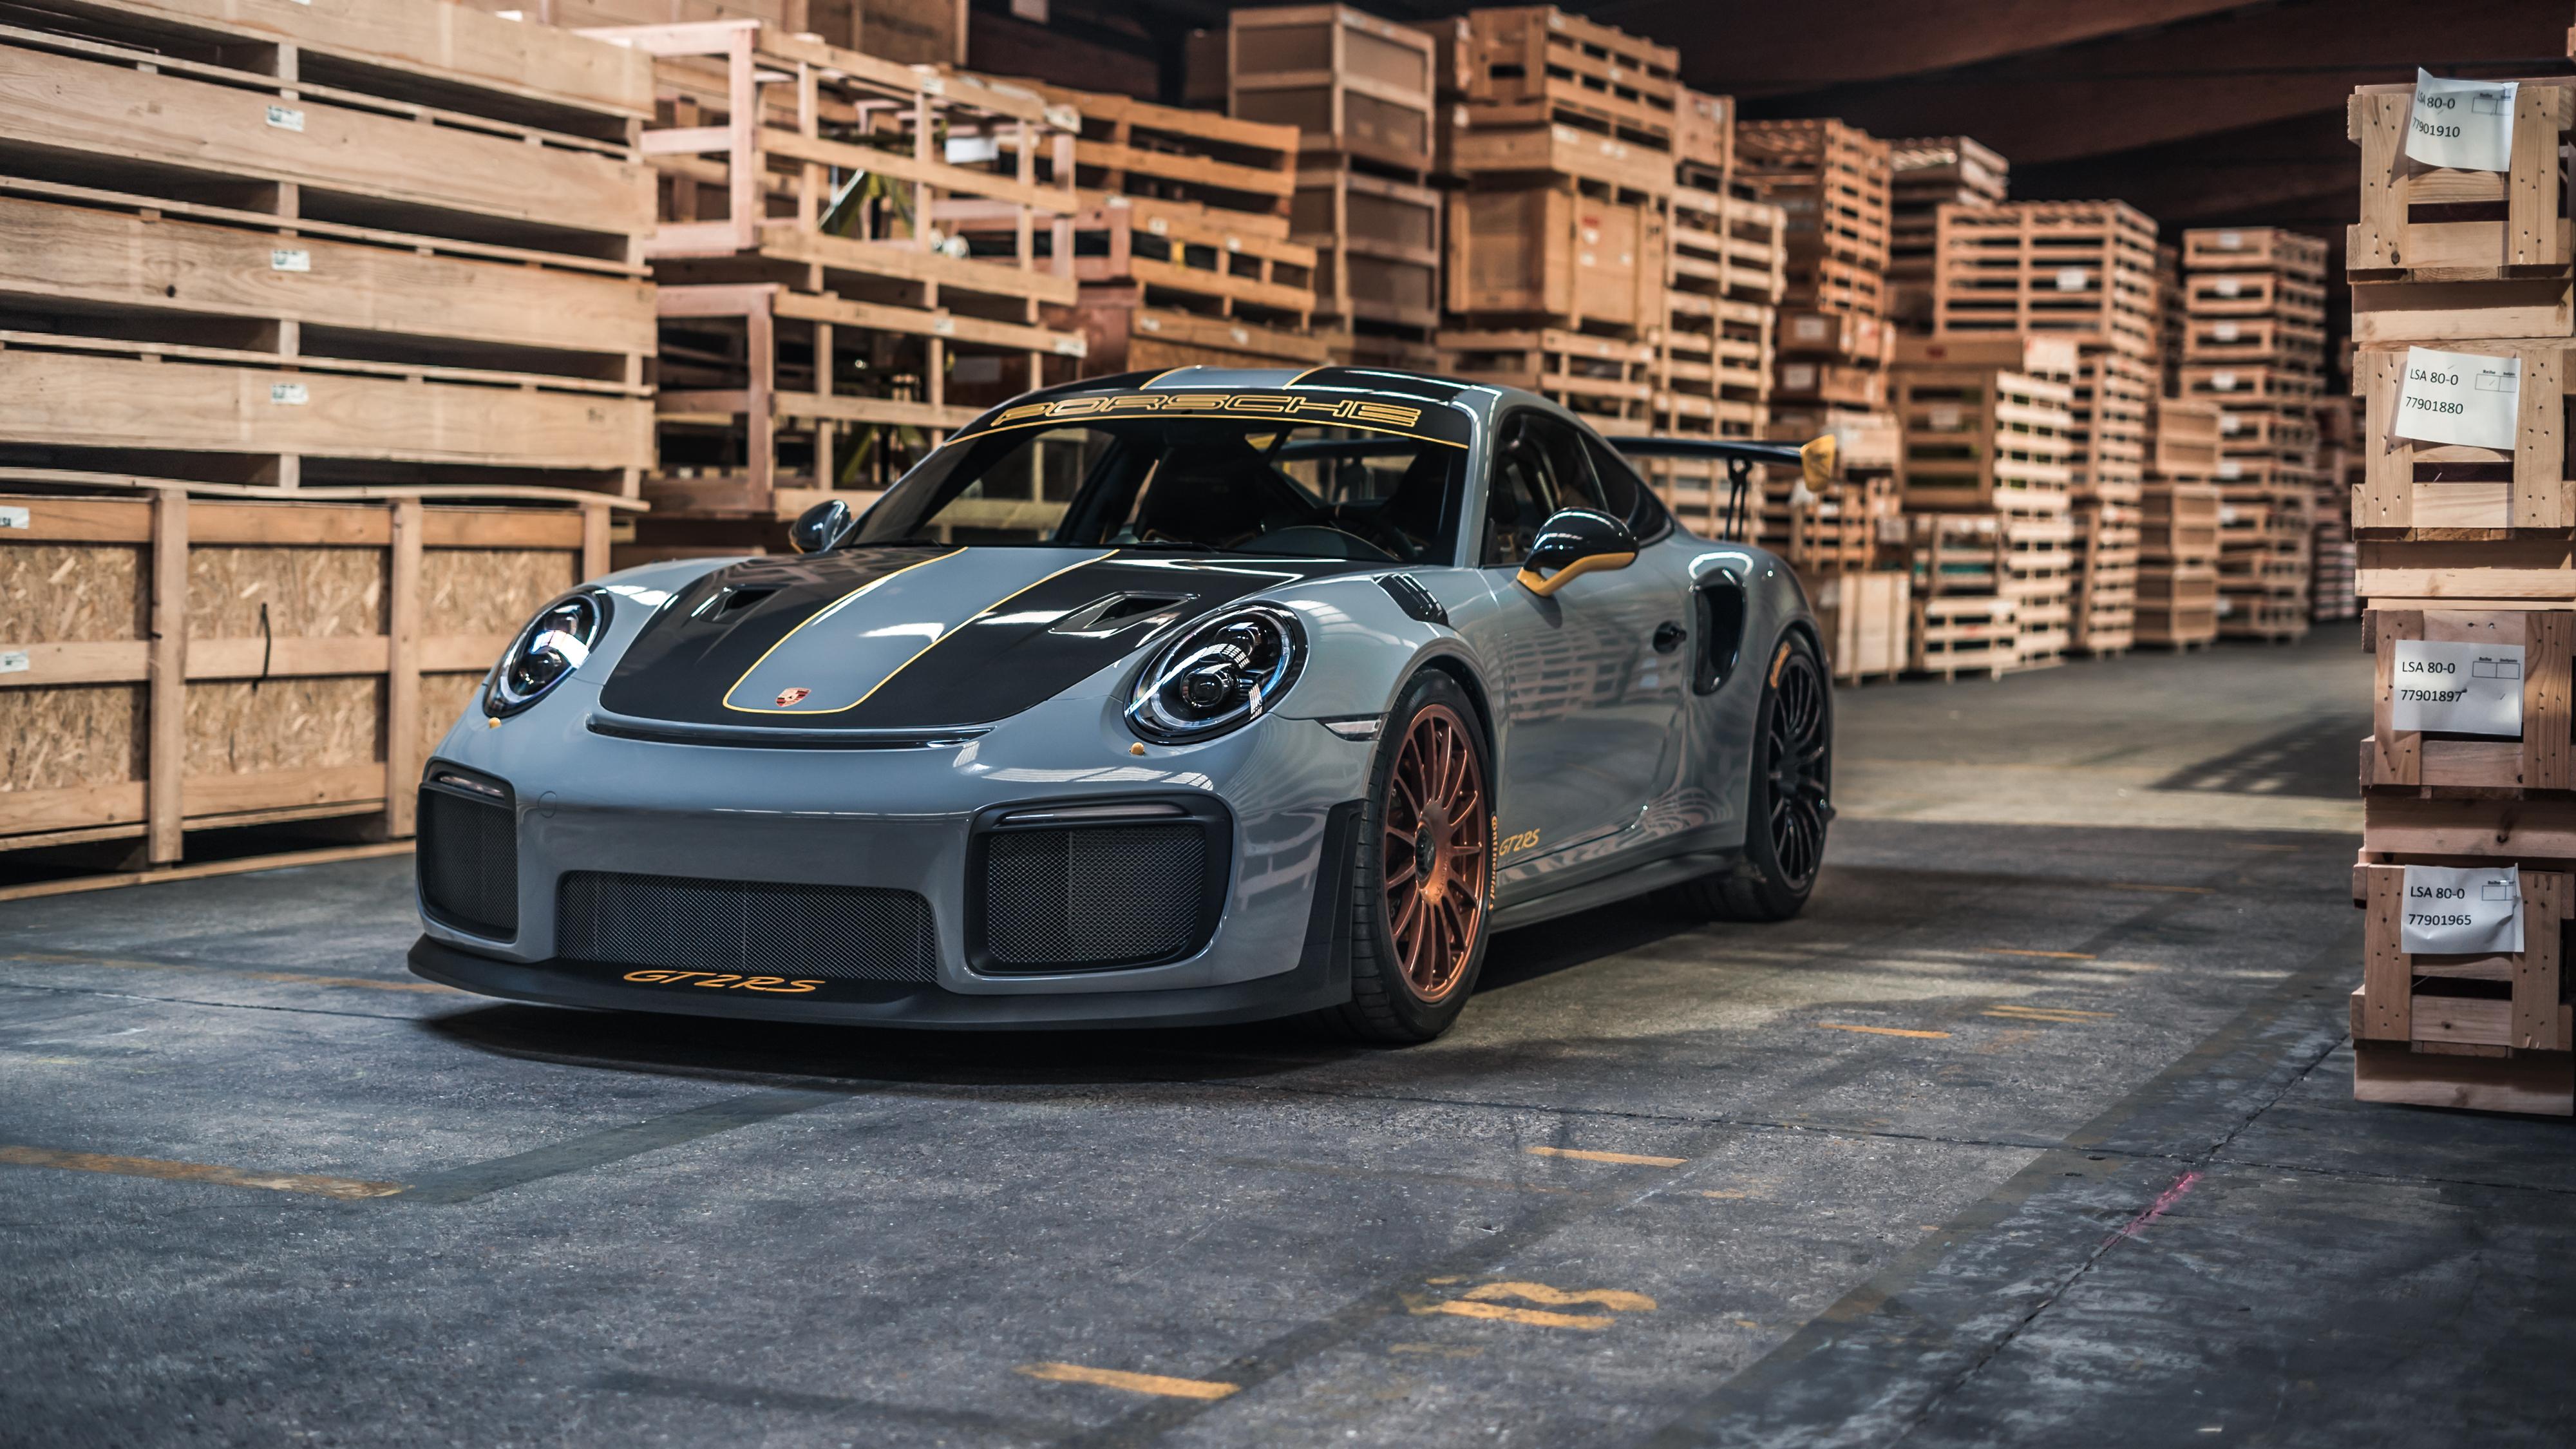 Edo Competition Porsche 911 Gt2 Rs 2020 4k 2 Wallpaper Hd Car Wallpapers Id 14478